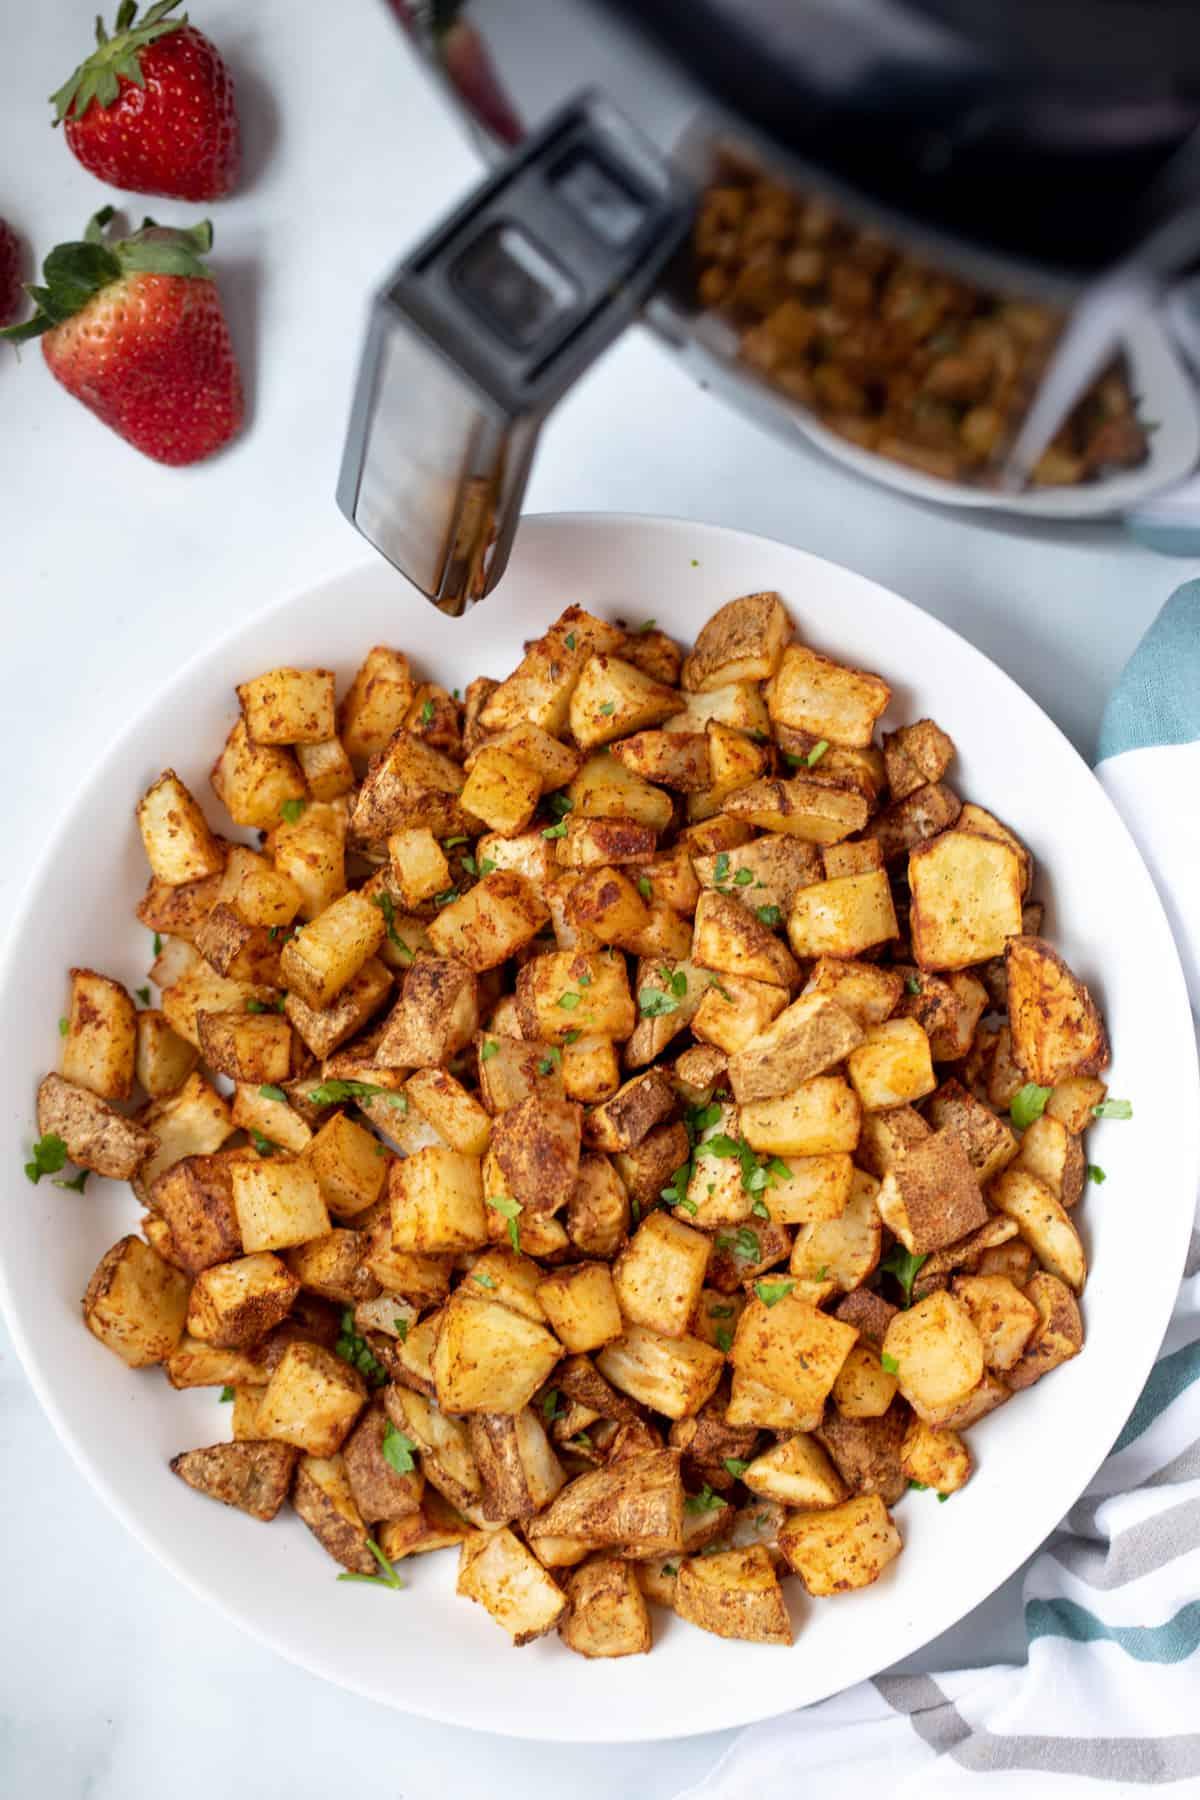 Bowl of crispy potato cubes next to air fryer.